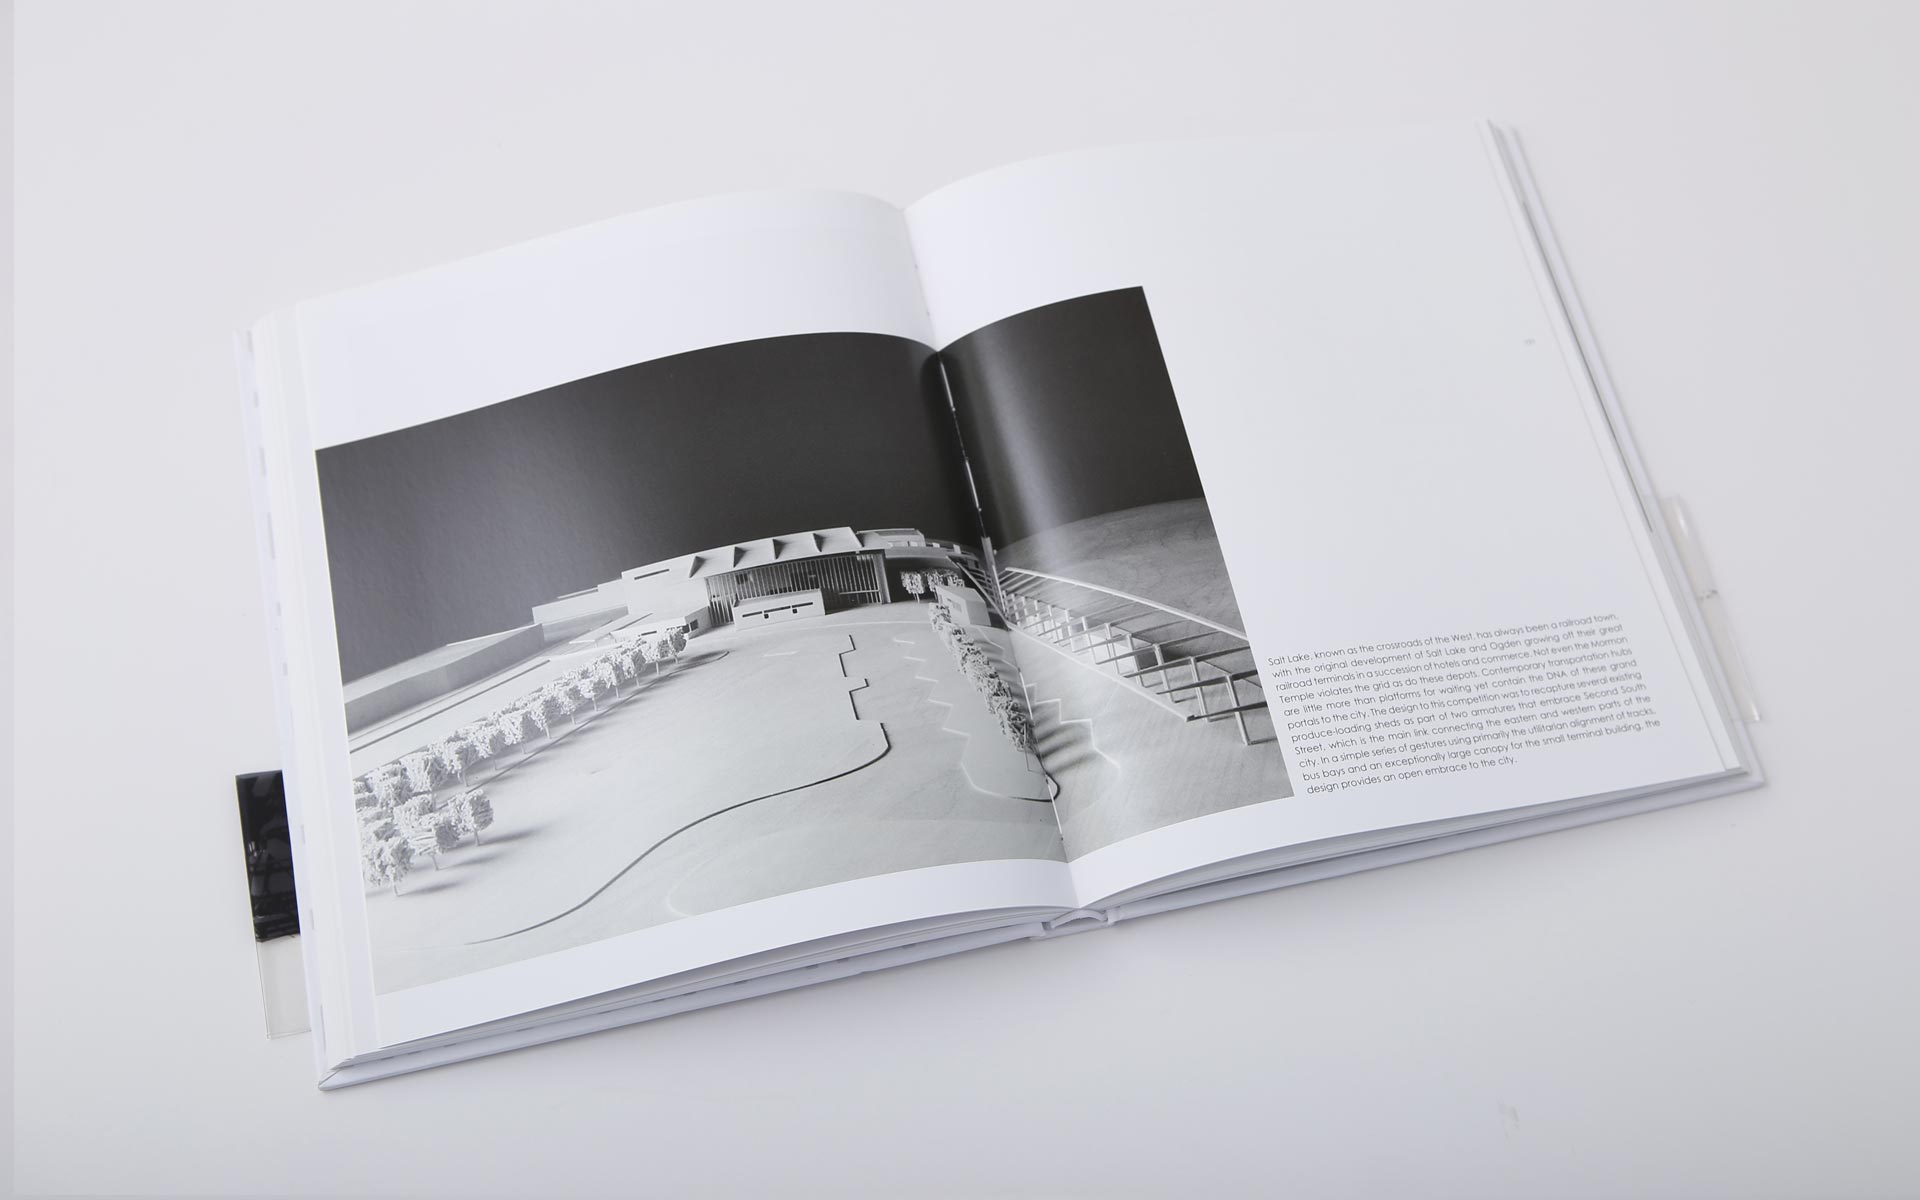 prescott-muir-architecture-book-design-2